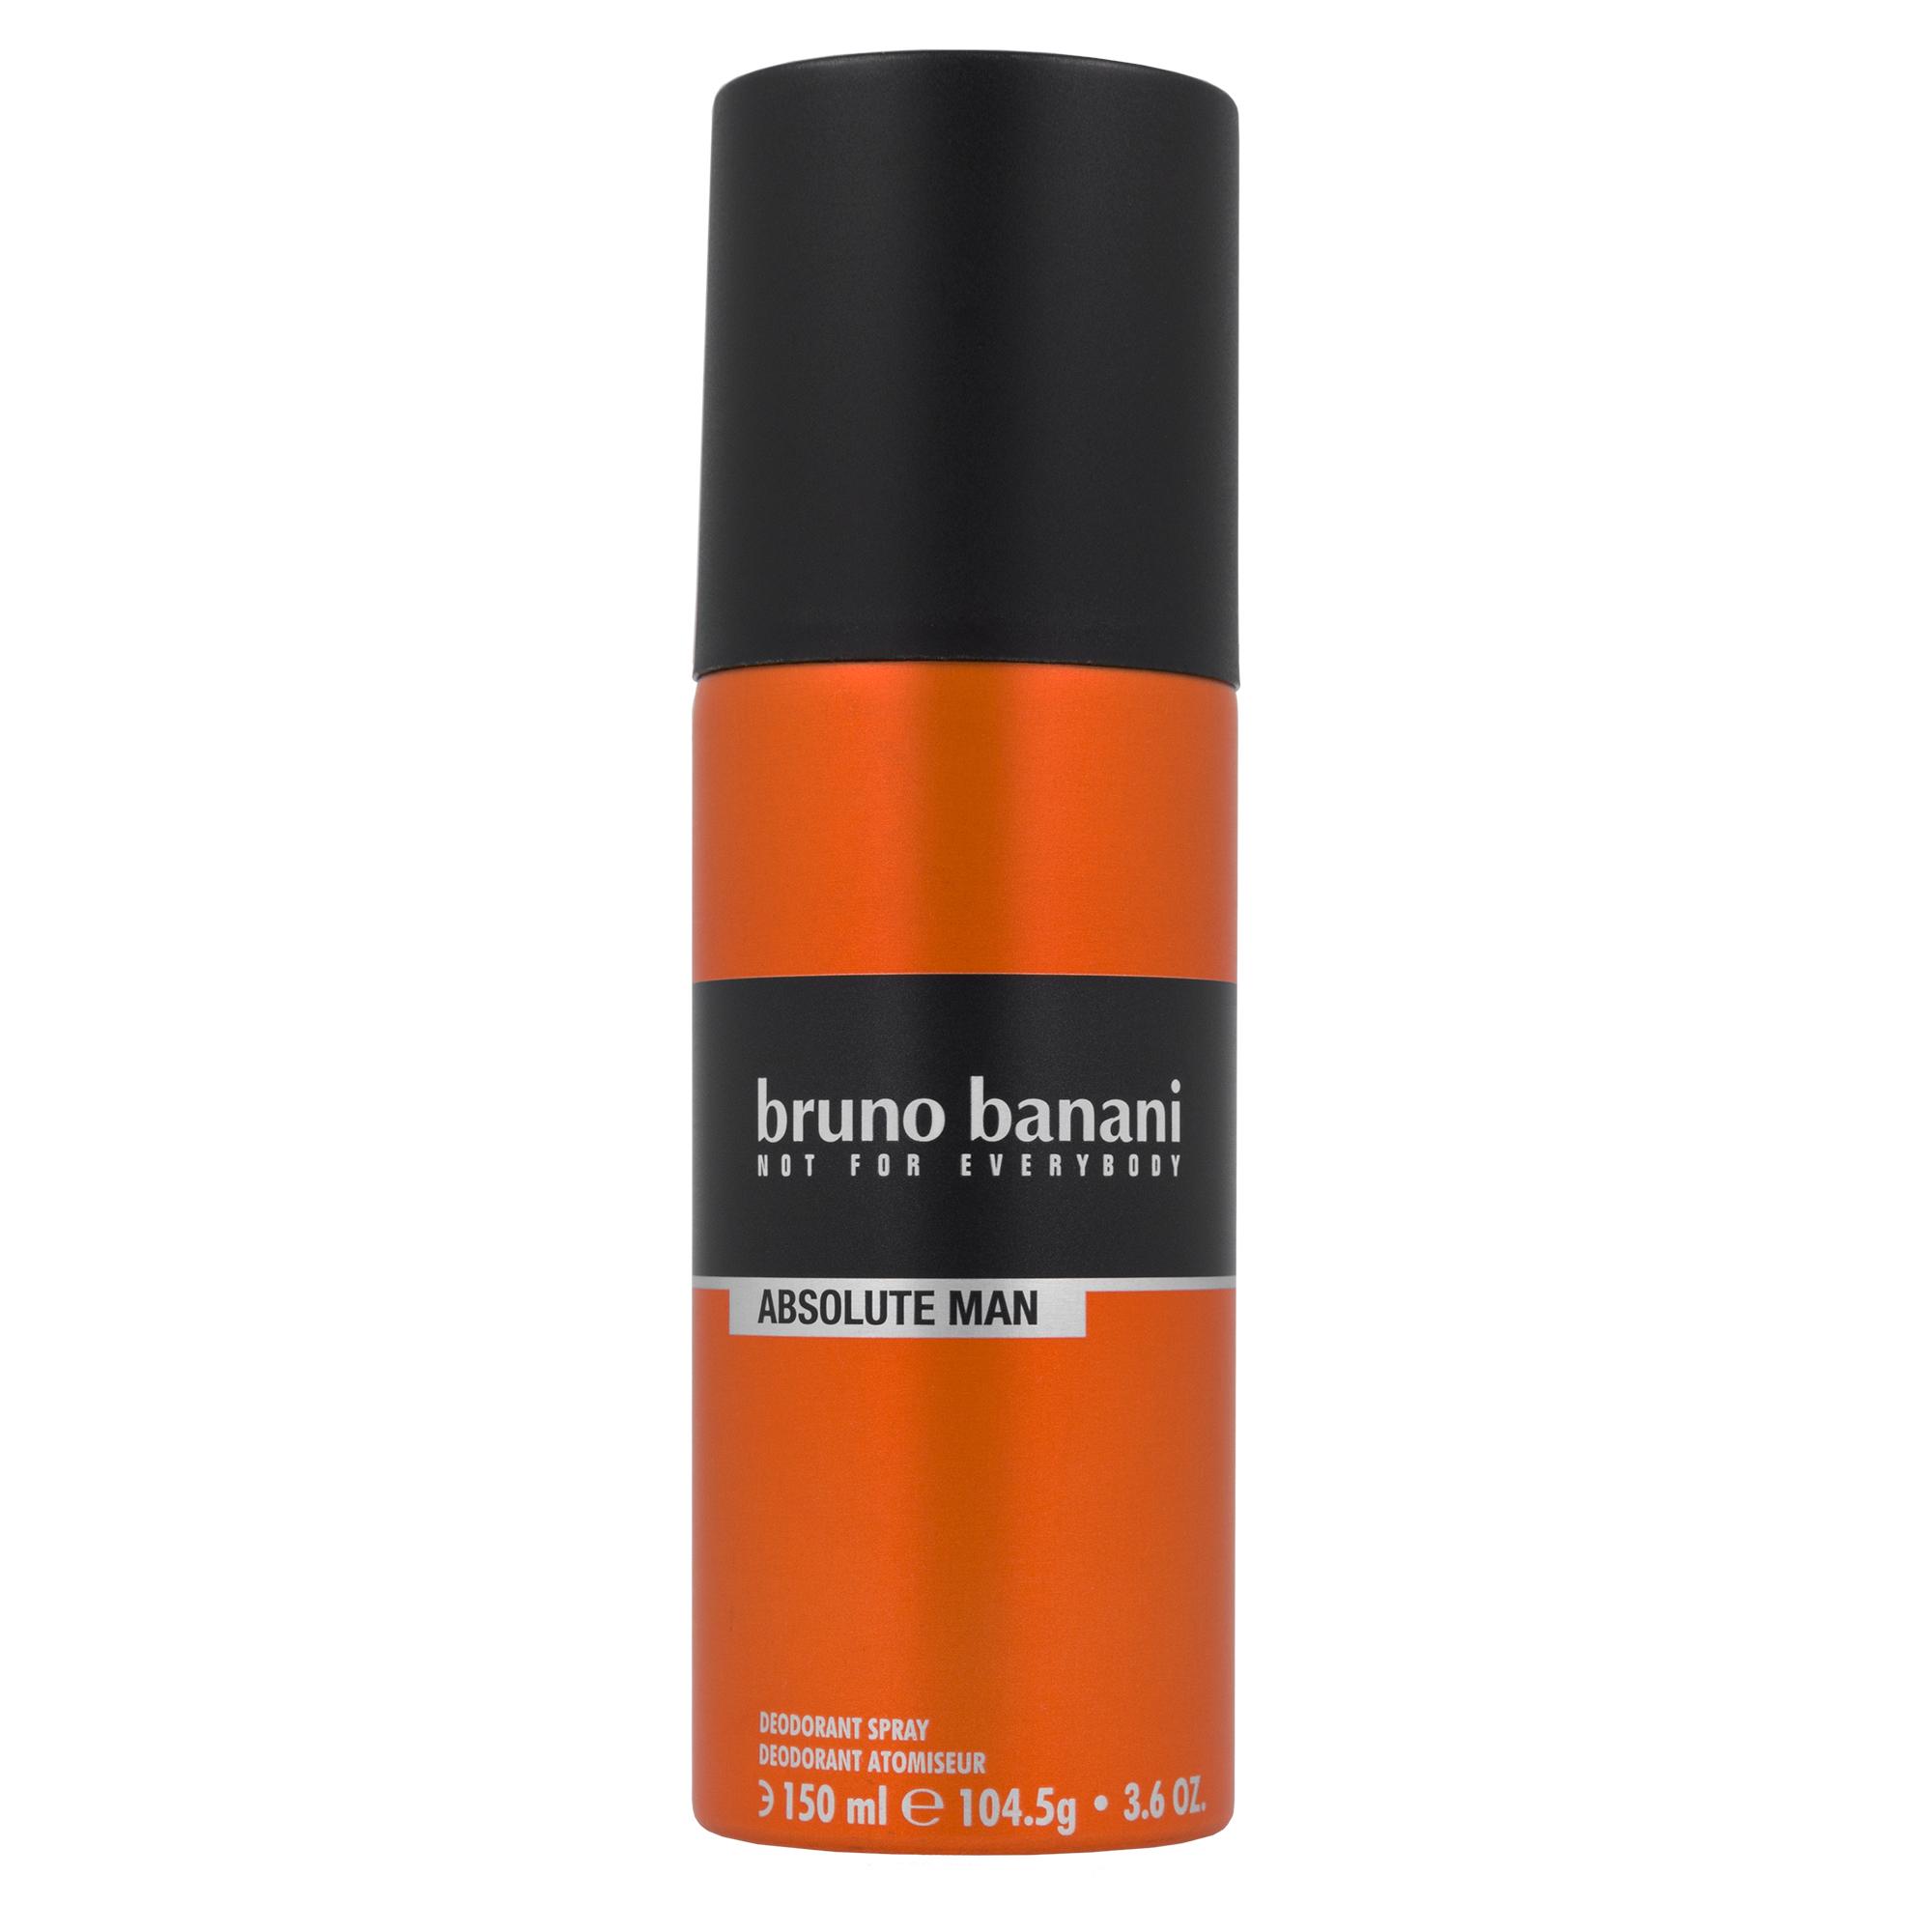 Bruno Banani - Absolute Man - Deodorant Spray 150 ml